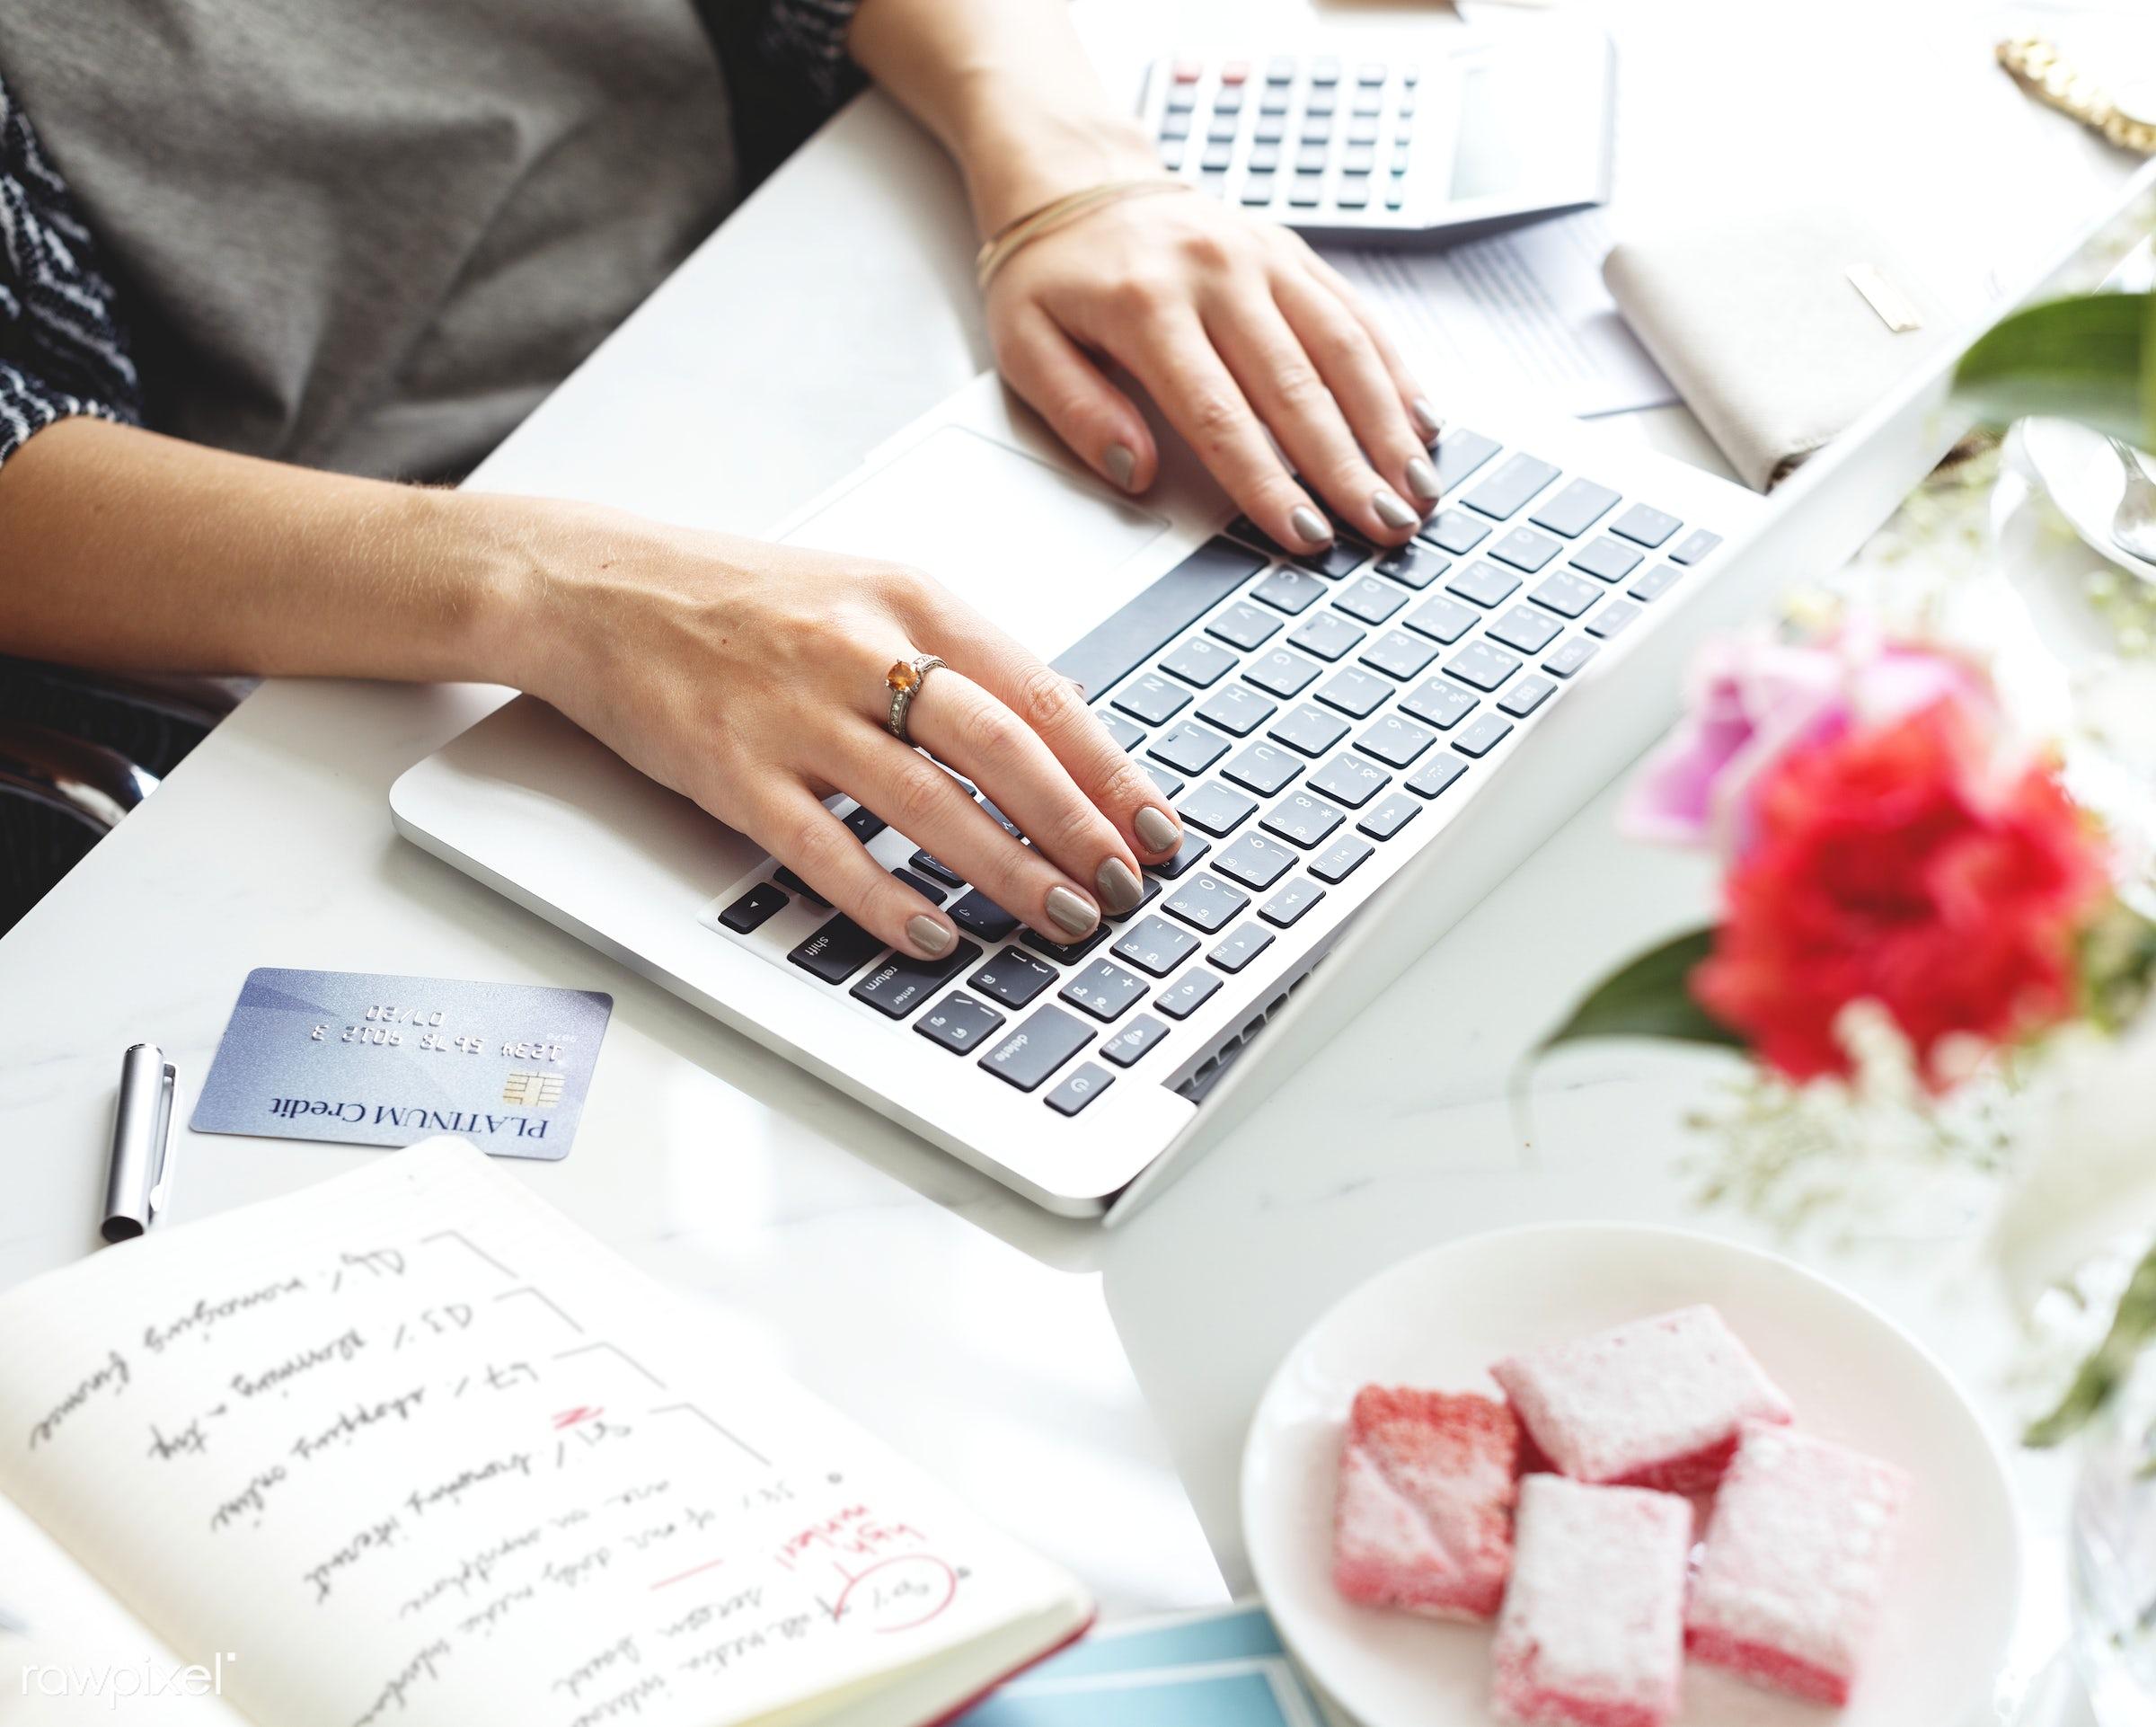 Woman working on computer laptop - financial, business, communication, computer, connection, device, digital, entrepreneur,...